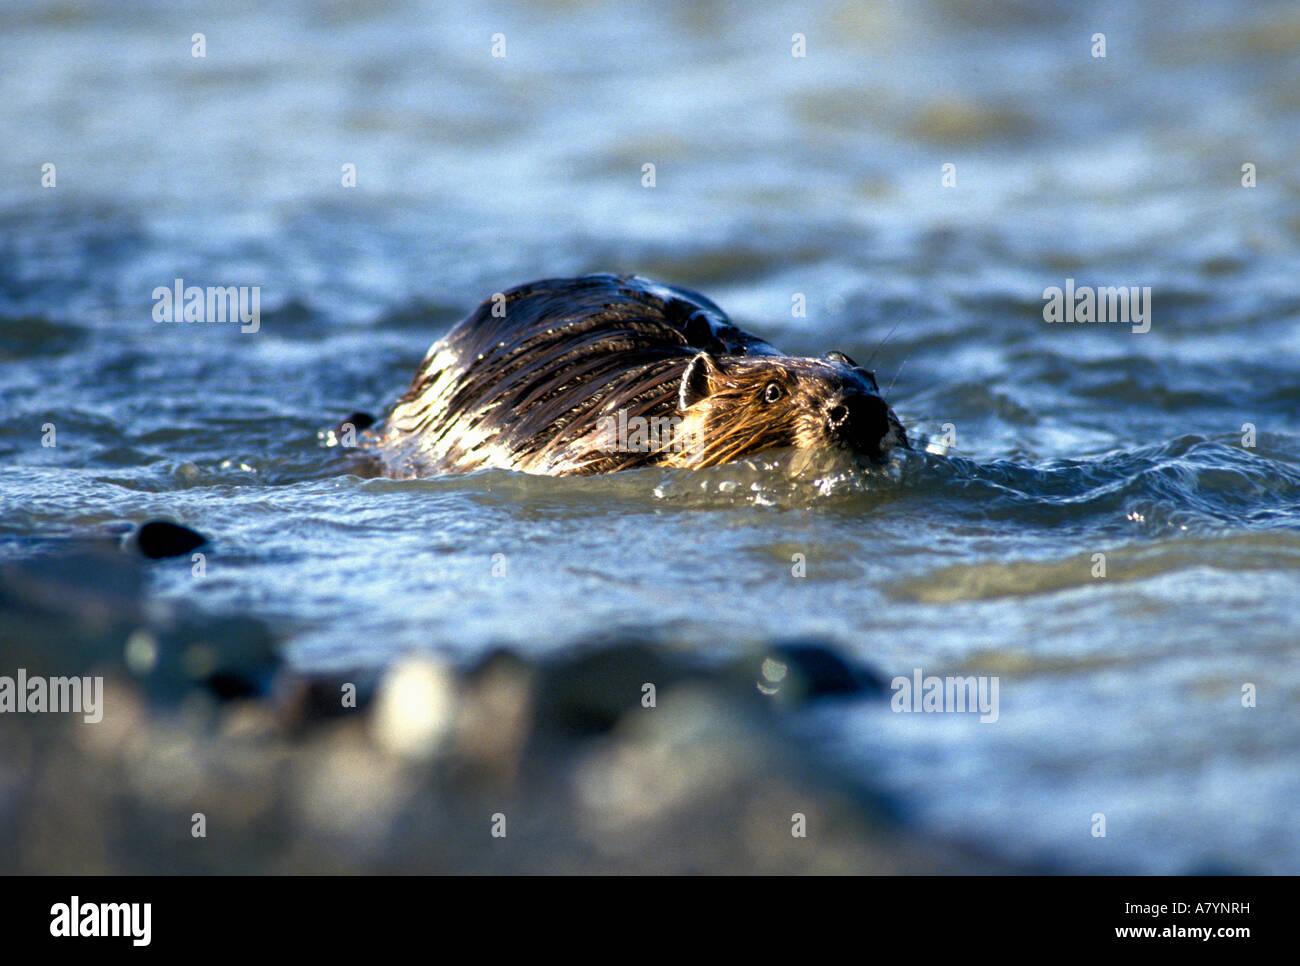 USA, Alaska, Denali National Park, Beaver (Castor canadensis) swims through swift waters of Teklanika River - Stock Image